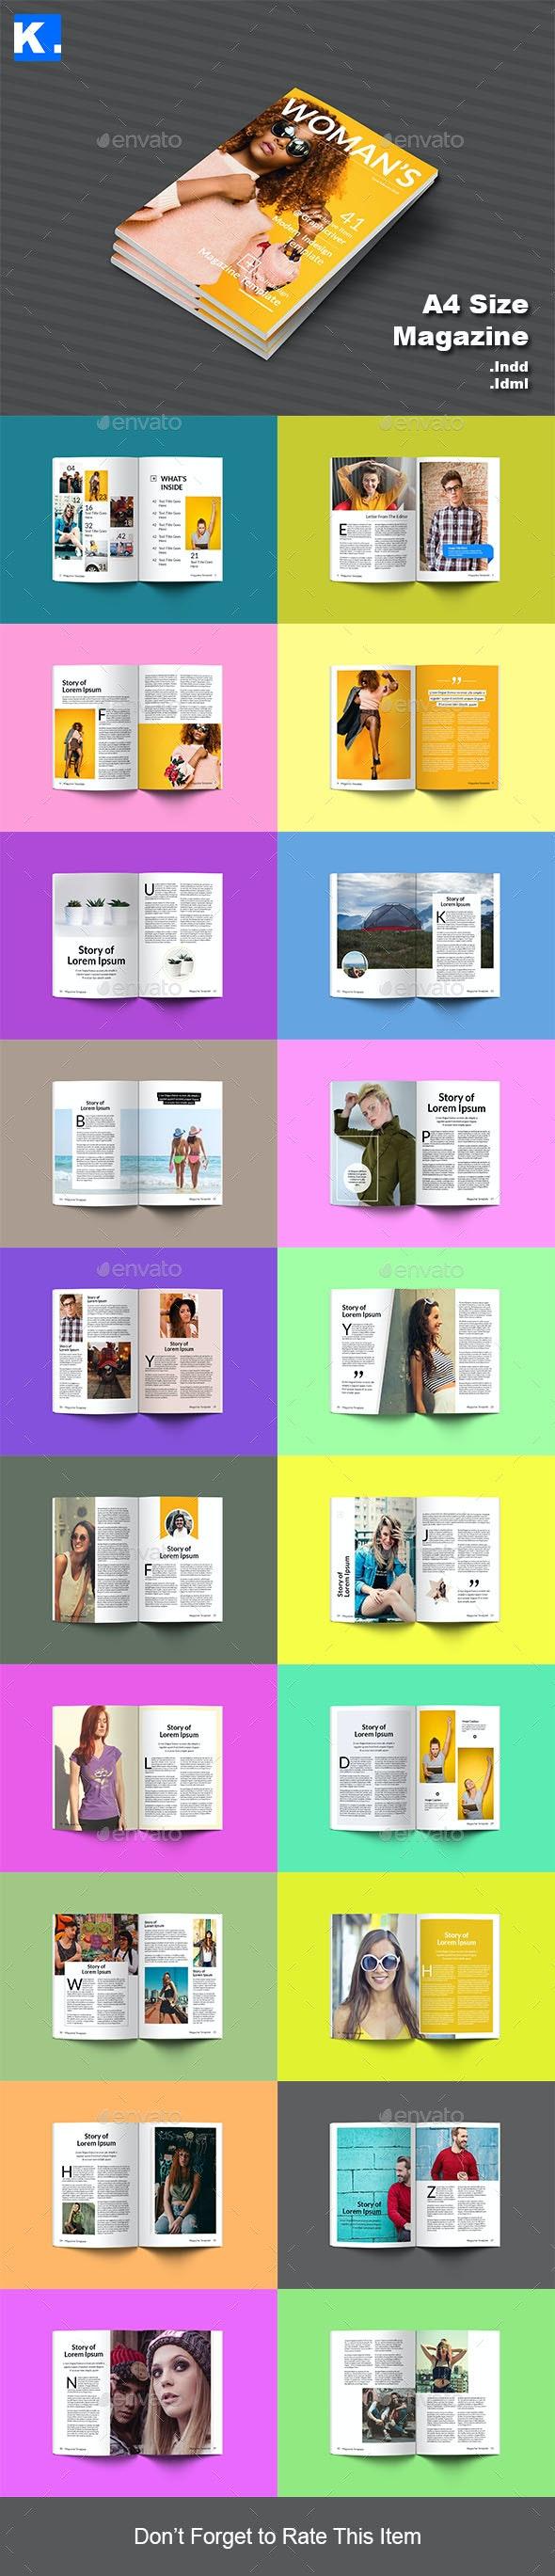 Indesign Magazine Template 8 - Magazines Print Templates